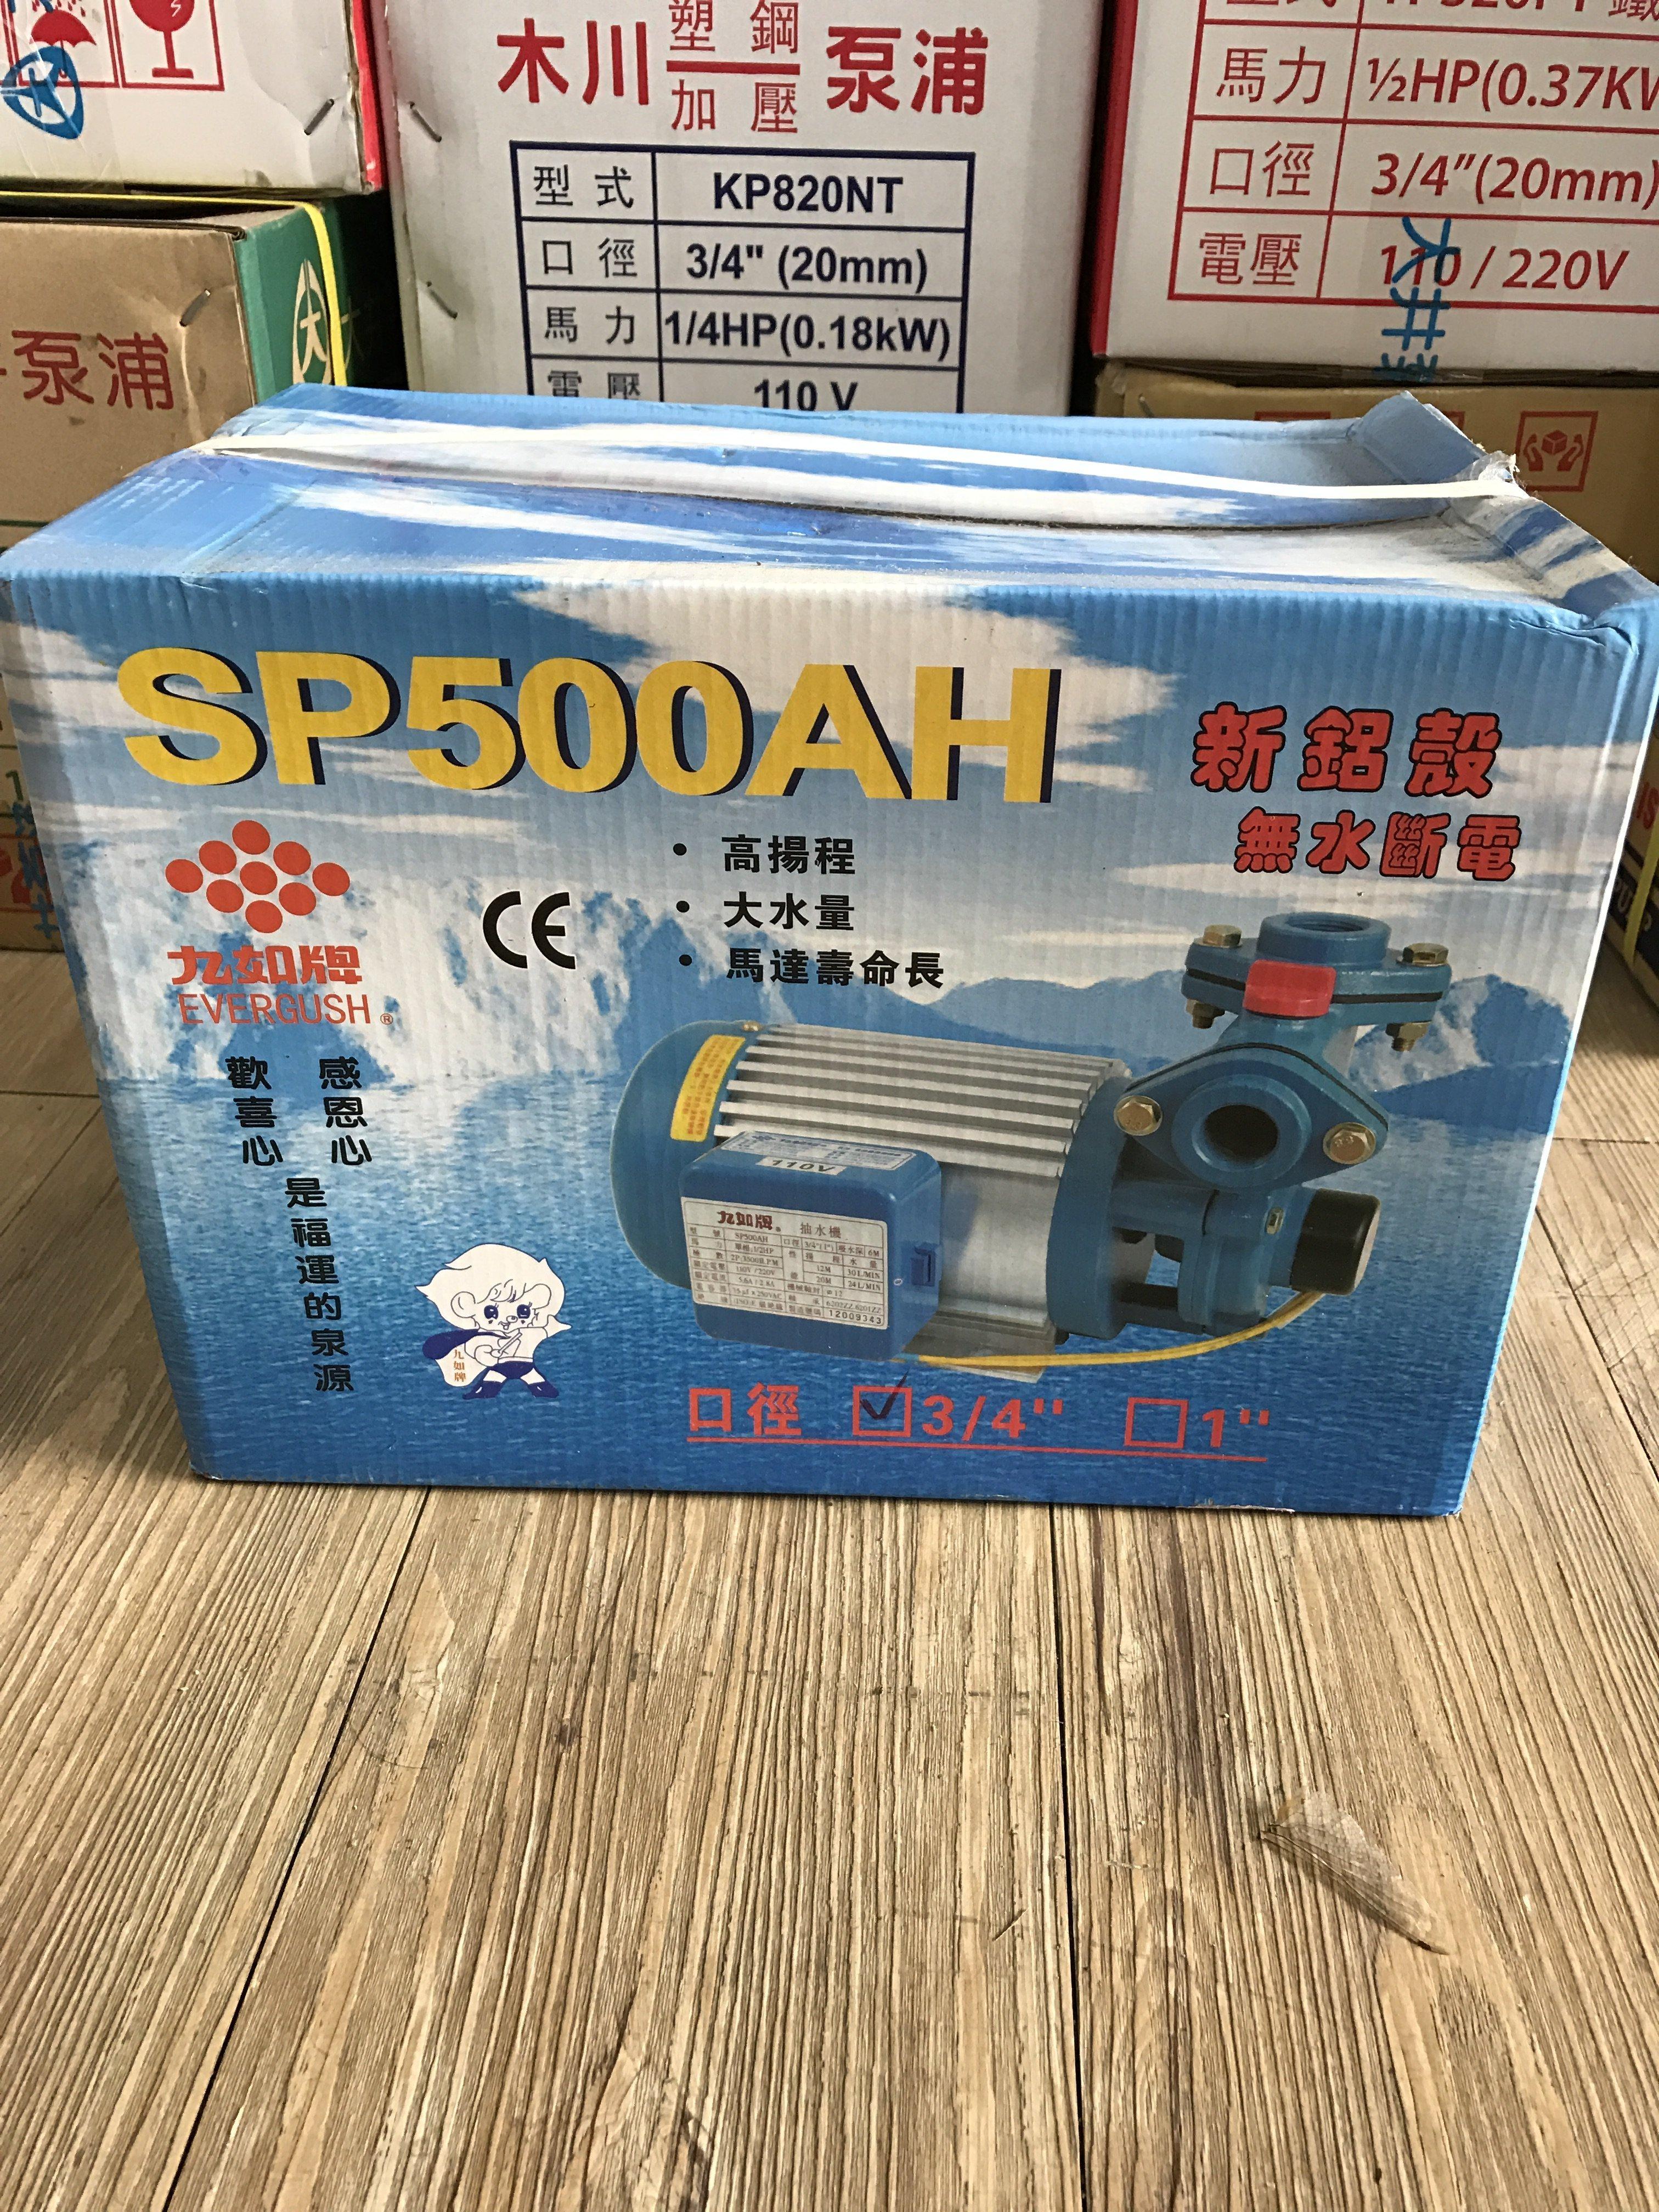 DIY水電材料 1/2HP 抽水馬達SP500AH 九如牌附無水斷電/ 另售東元牌 大井 木川